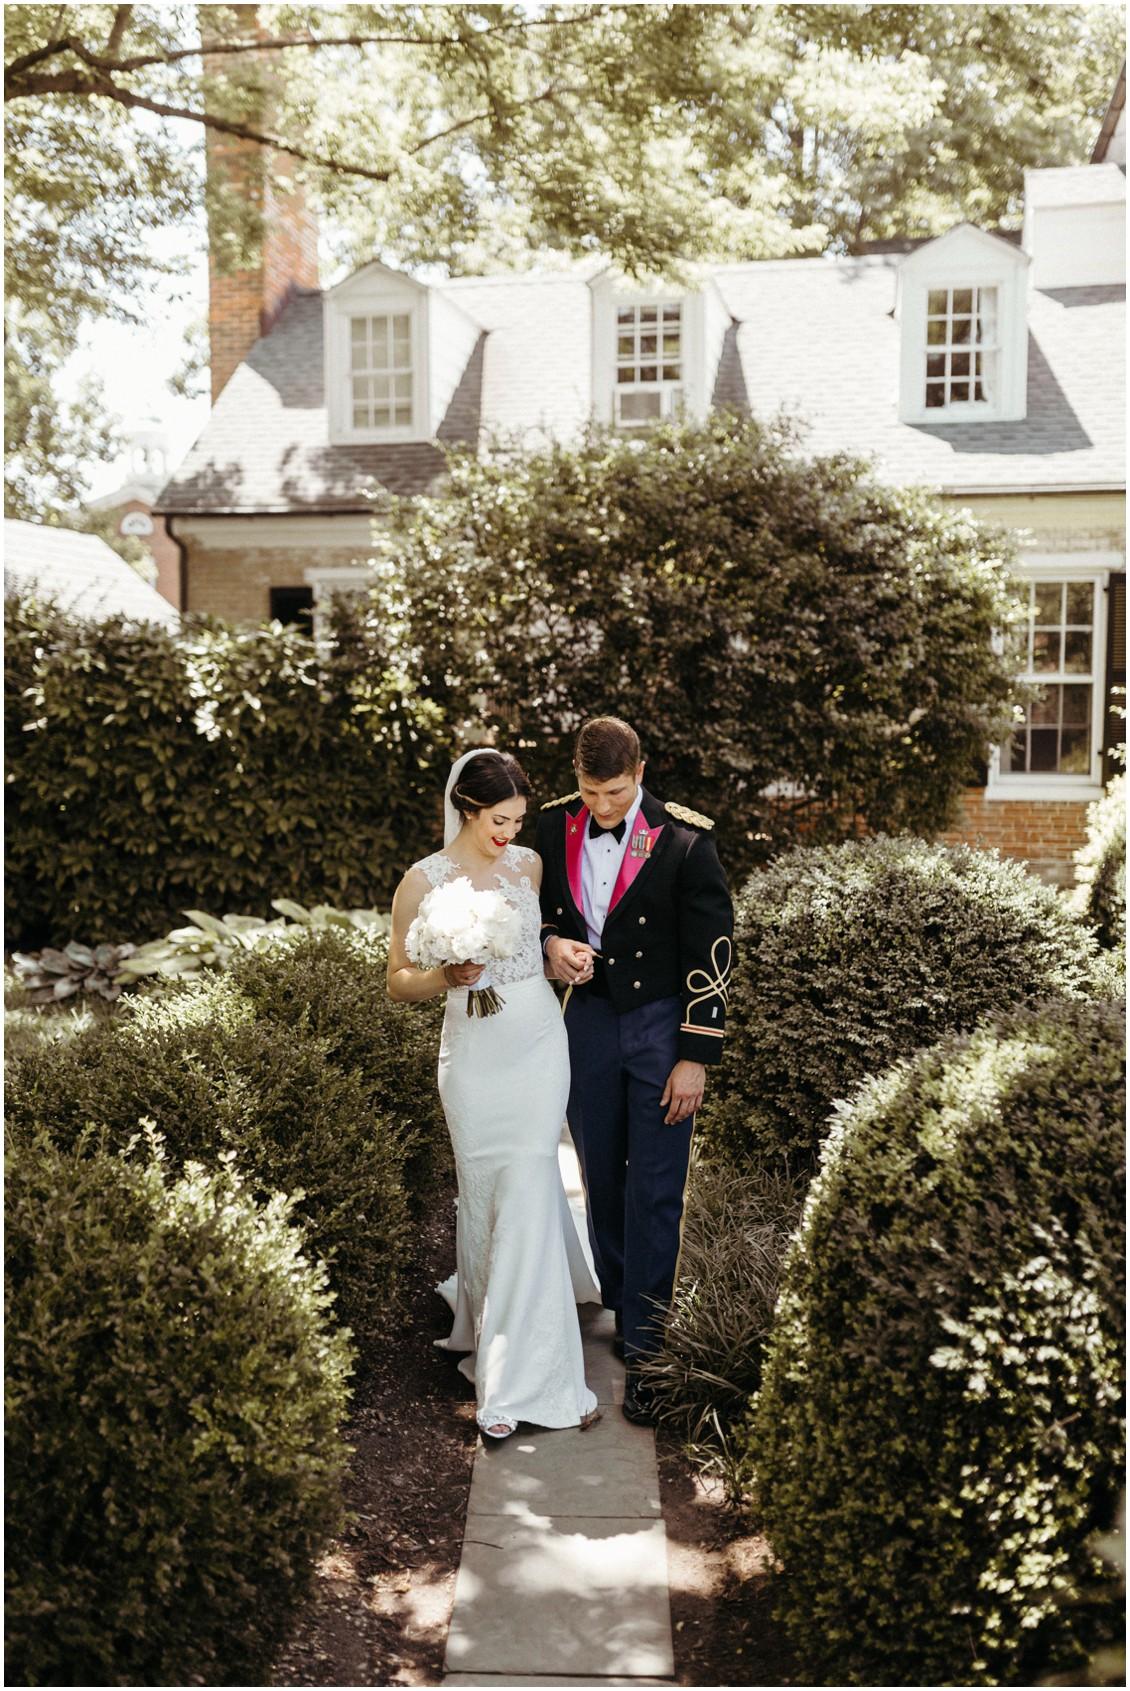 Bride and groom walking through a courtyard. | My Eastern Shore Wedding |